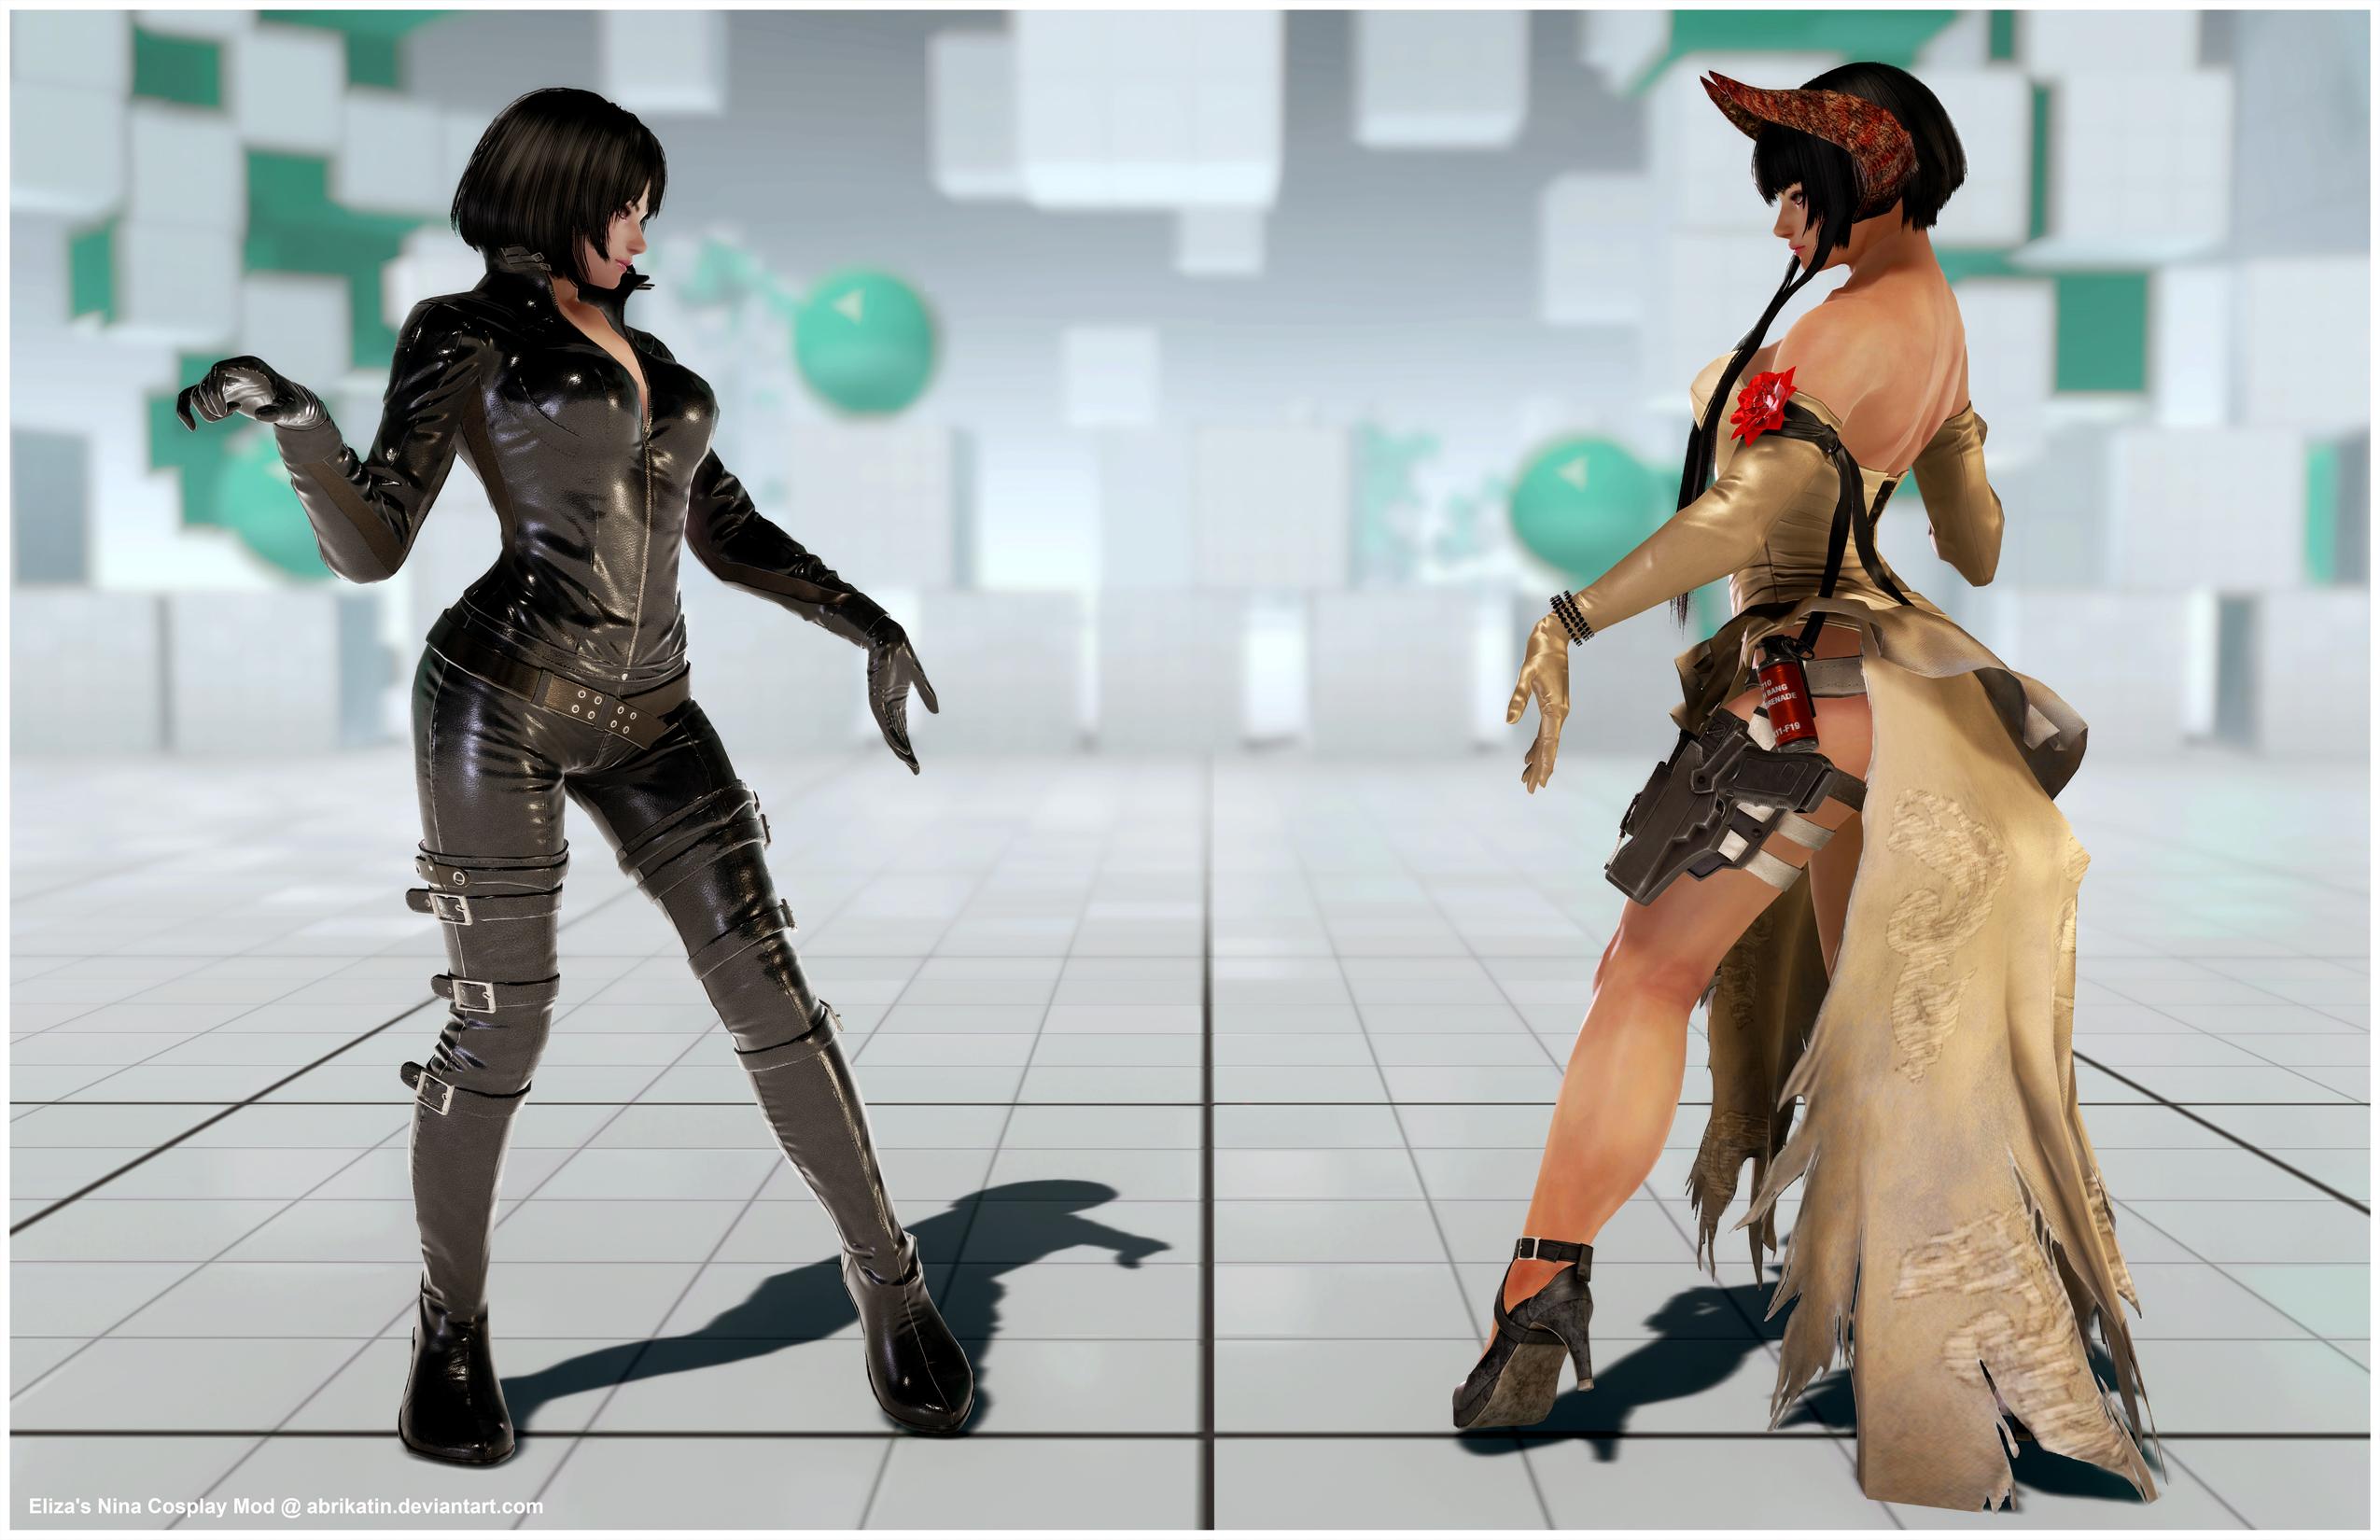 Eliza's Nina Cosplay [Tekken 7 PC mod] by Abrikatin